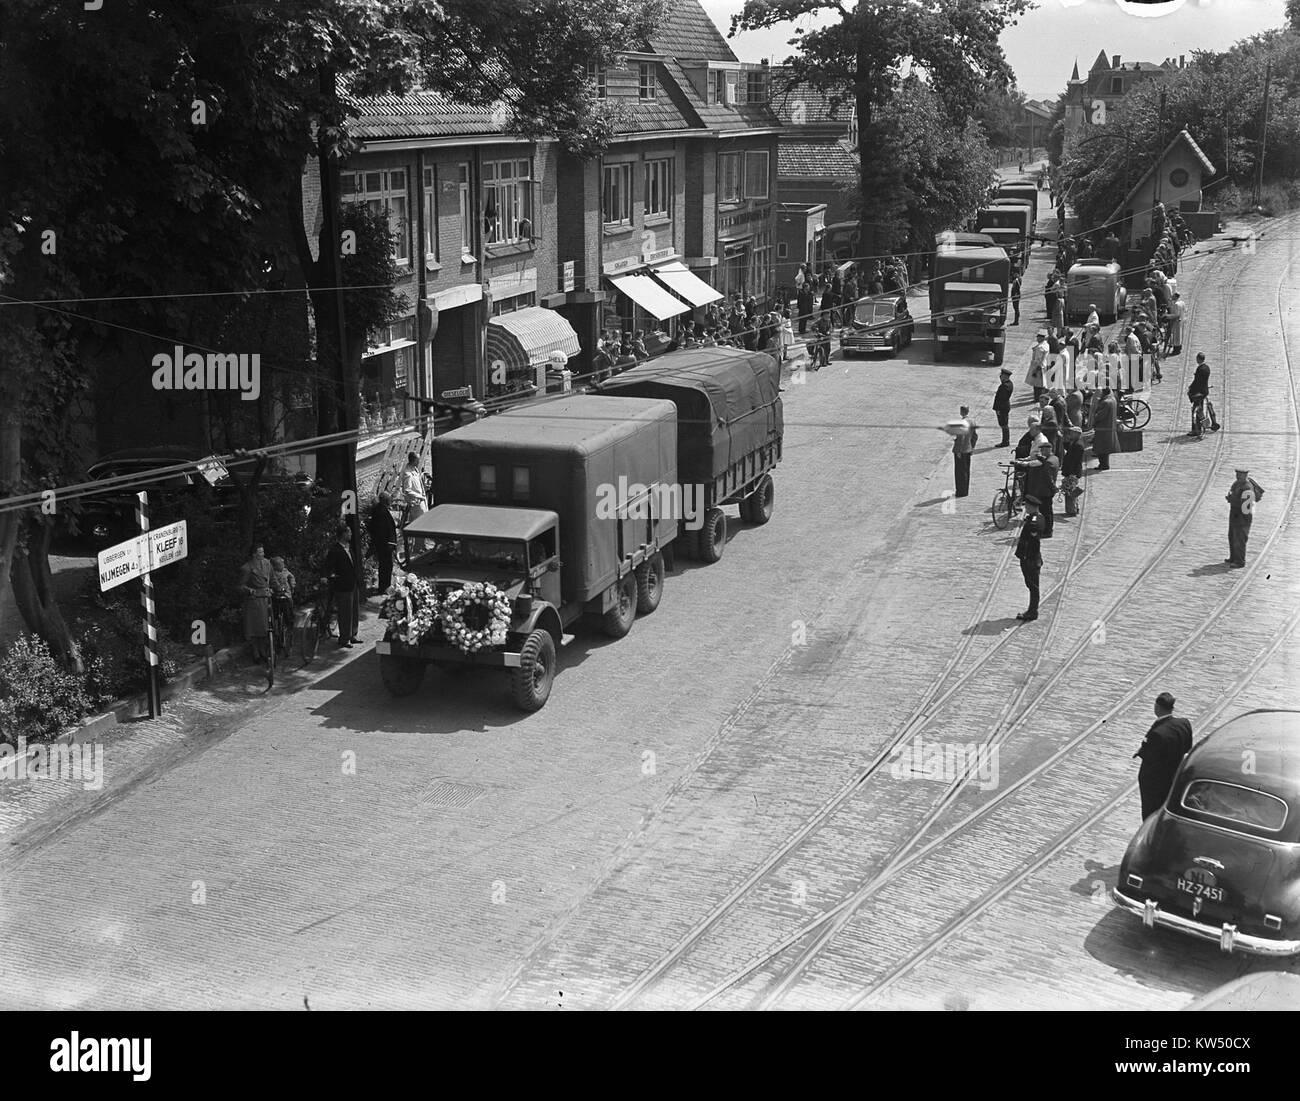 Bodemtransport uit Duitsland Beel, Bestanddeelnr 902 7725 - Stock Image